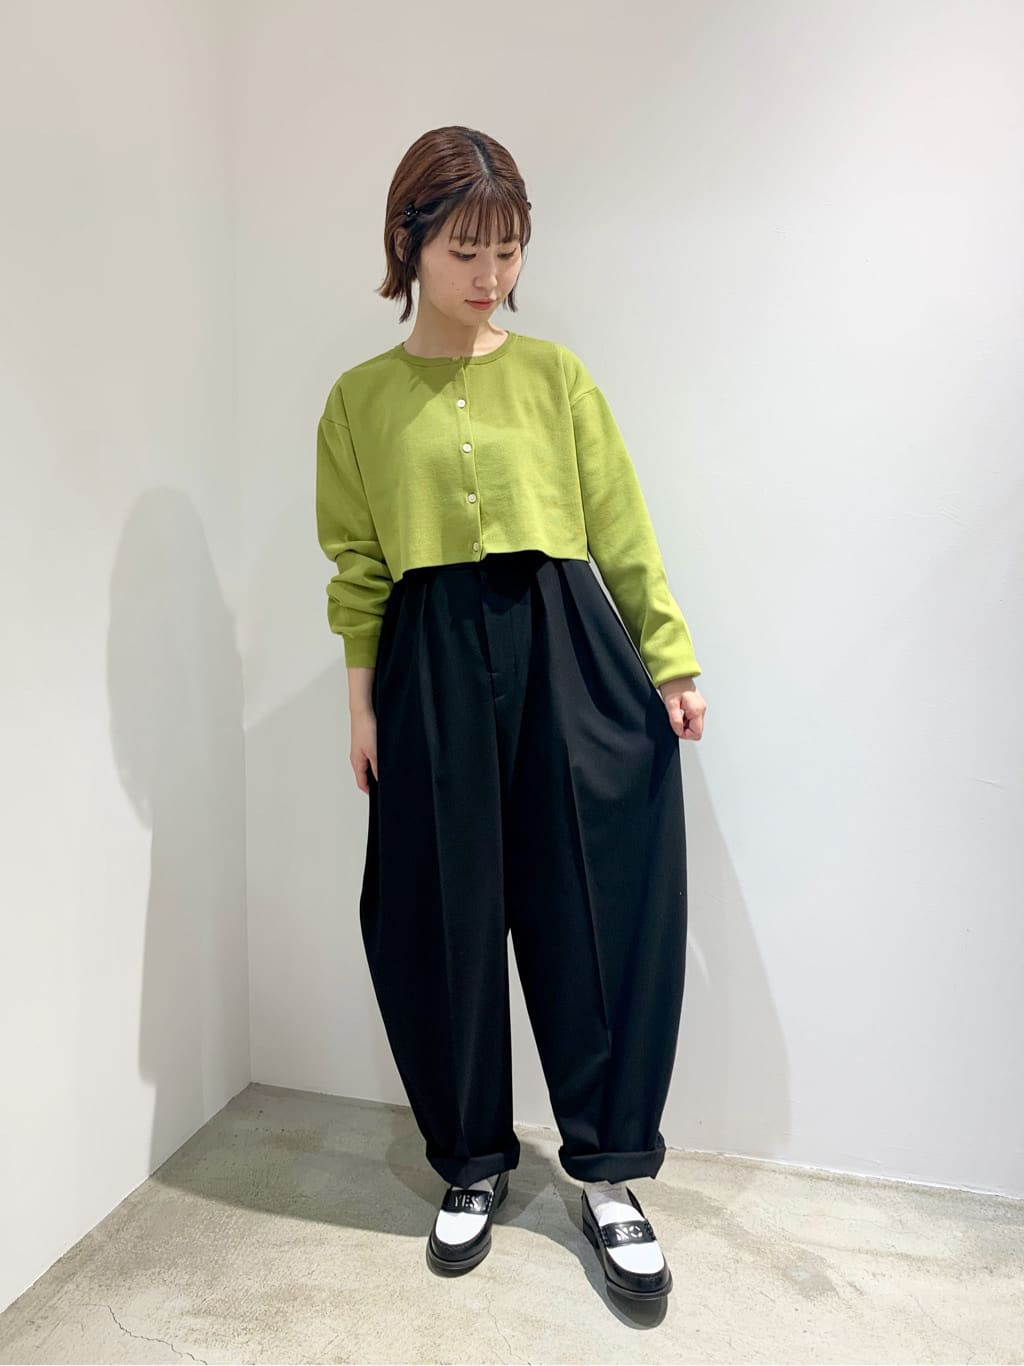 l'atelier du savon ルクア大阪 身長:157cm 2021.09.07